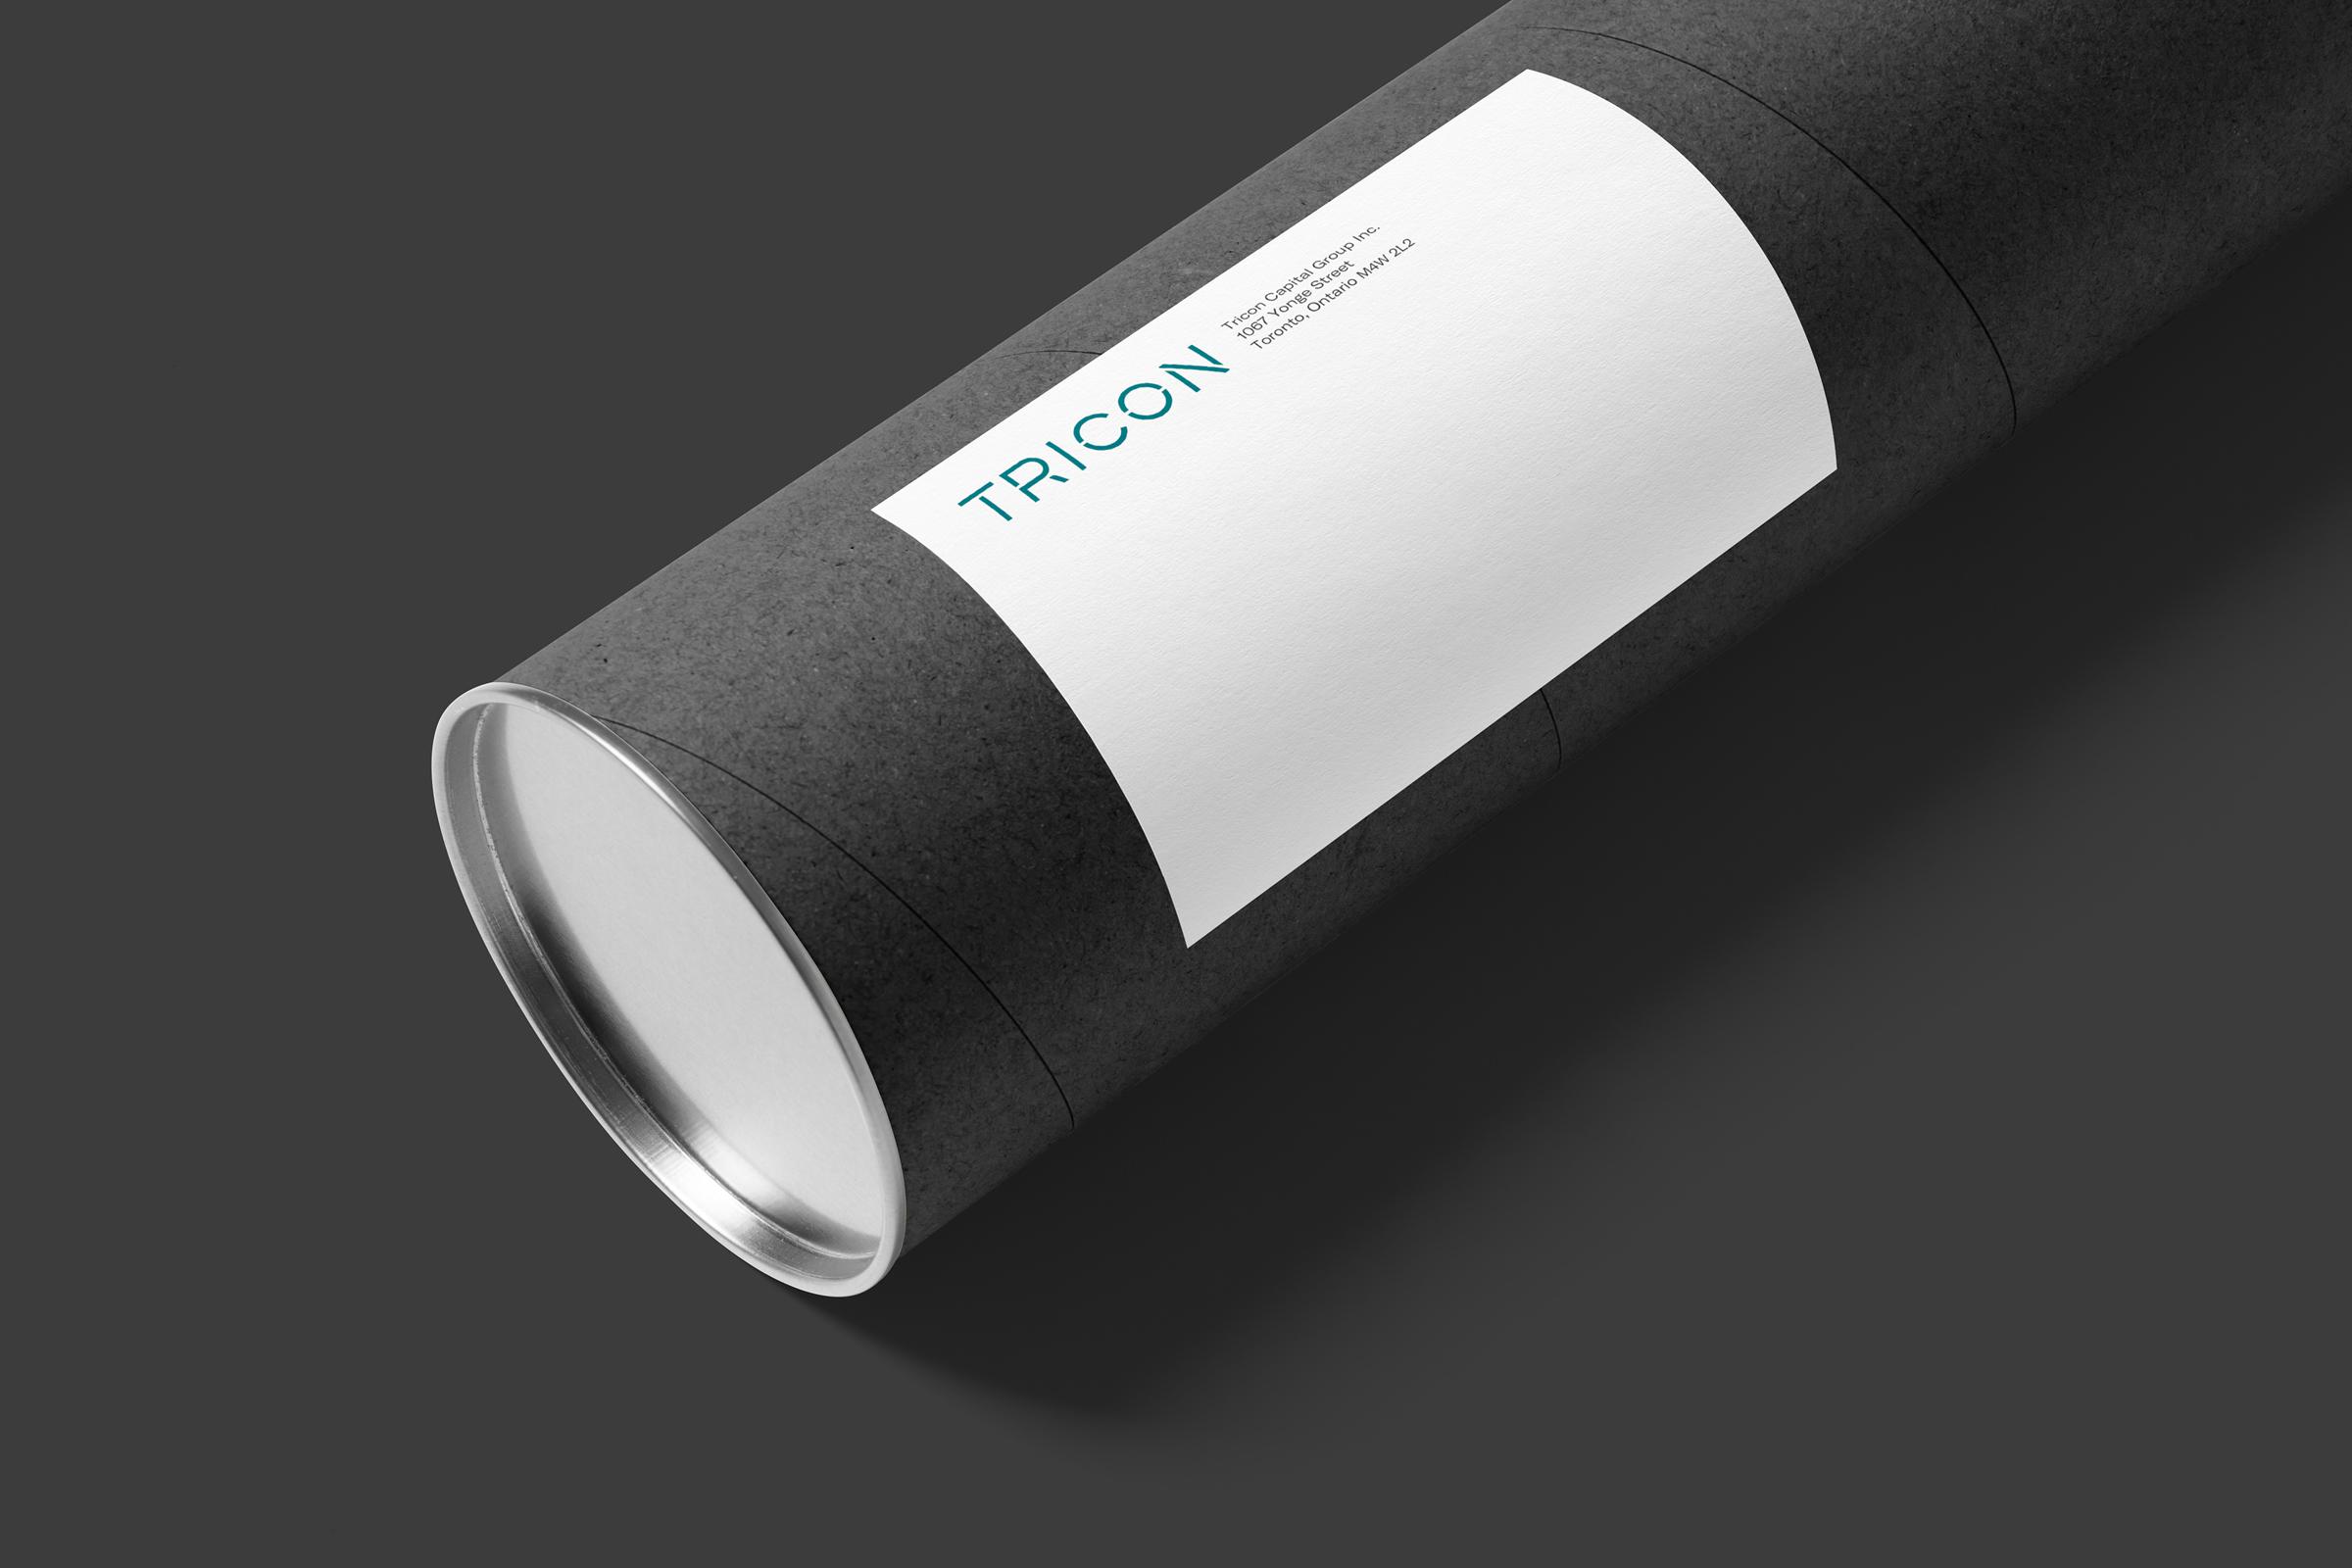 Tricon-05.jpg